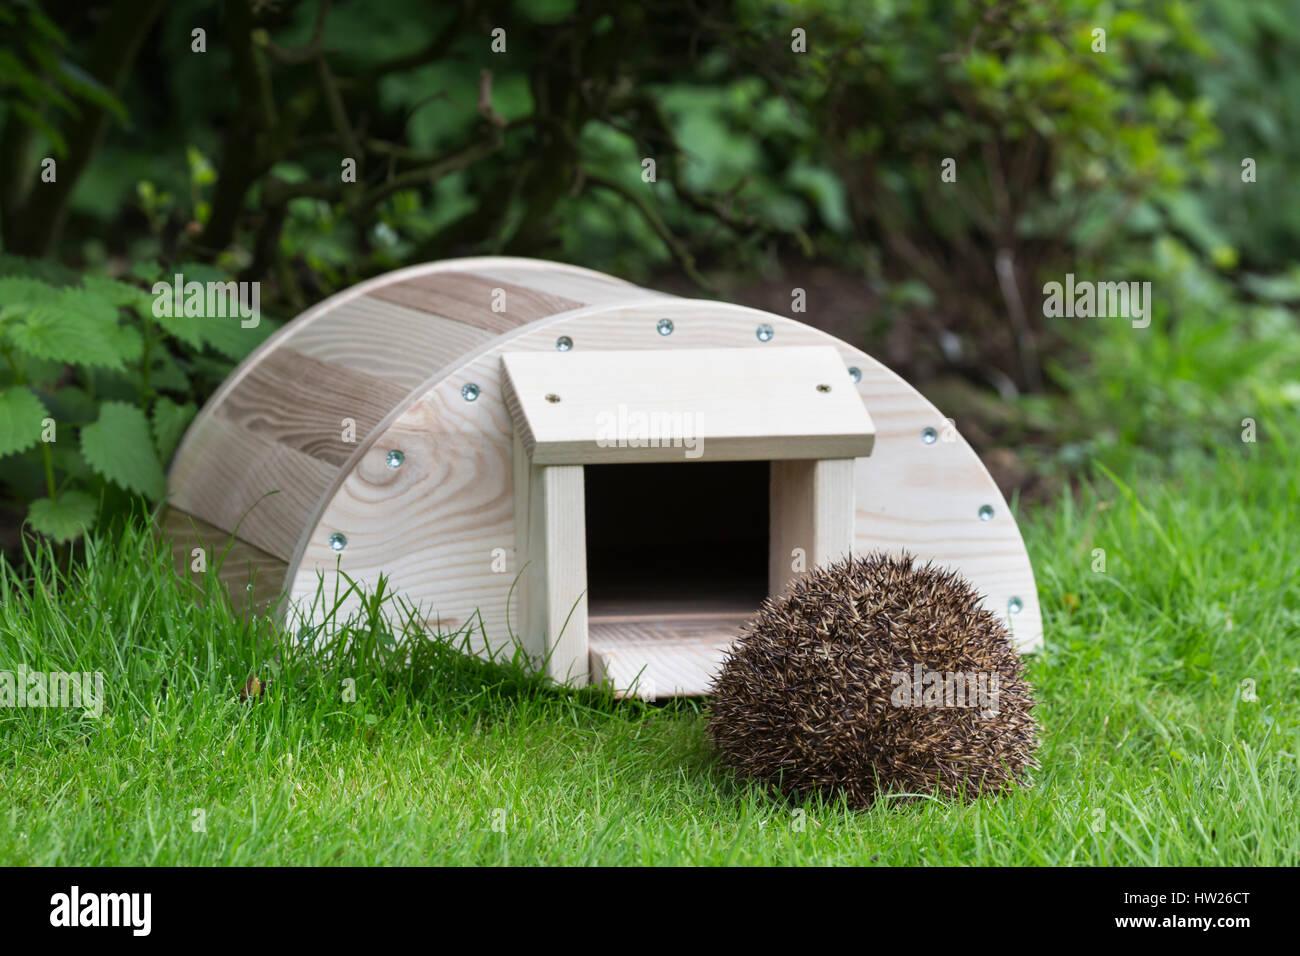 Hedgehog (Erinaceus europaeus) entering hedgehog house, captive, UK, August 2016 Stock Photo